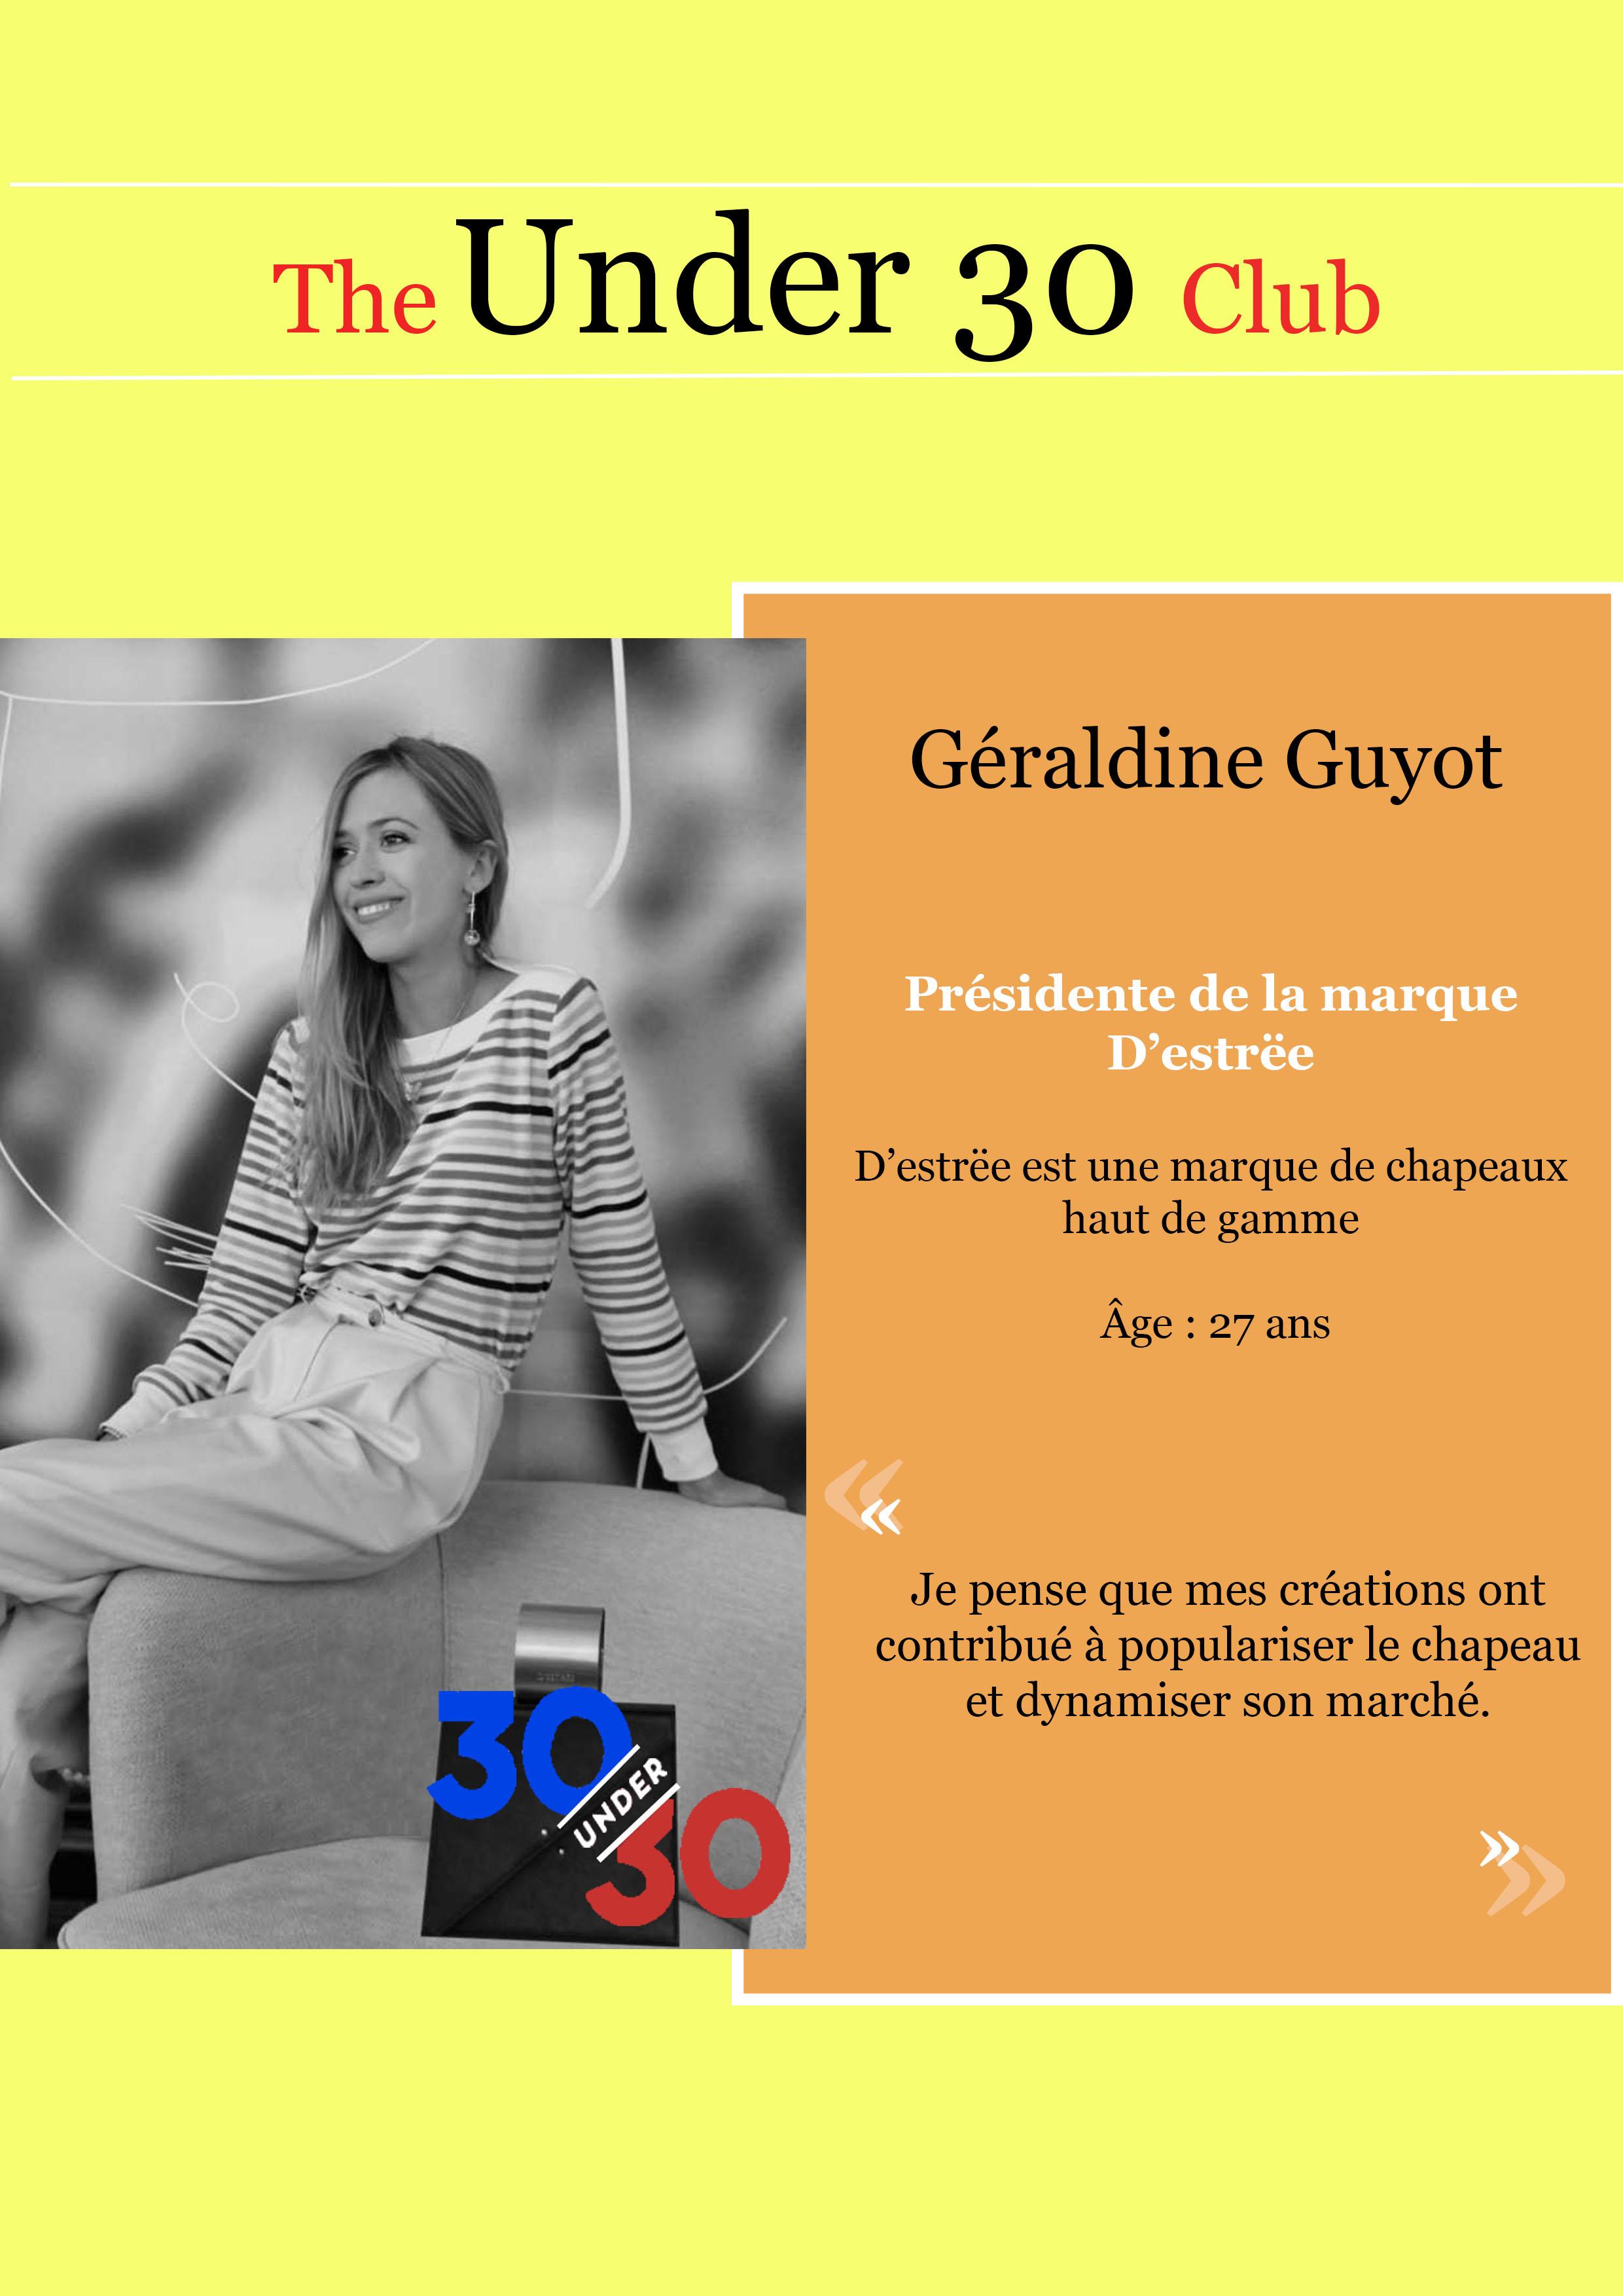 Geraldine Guyot